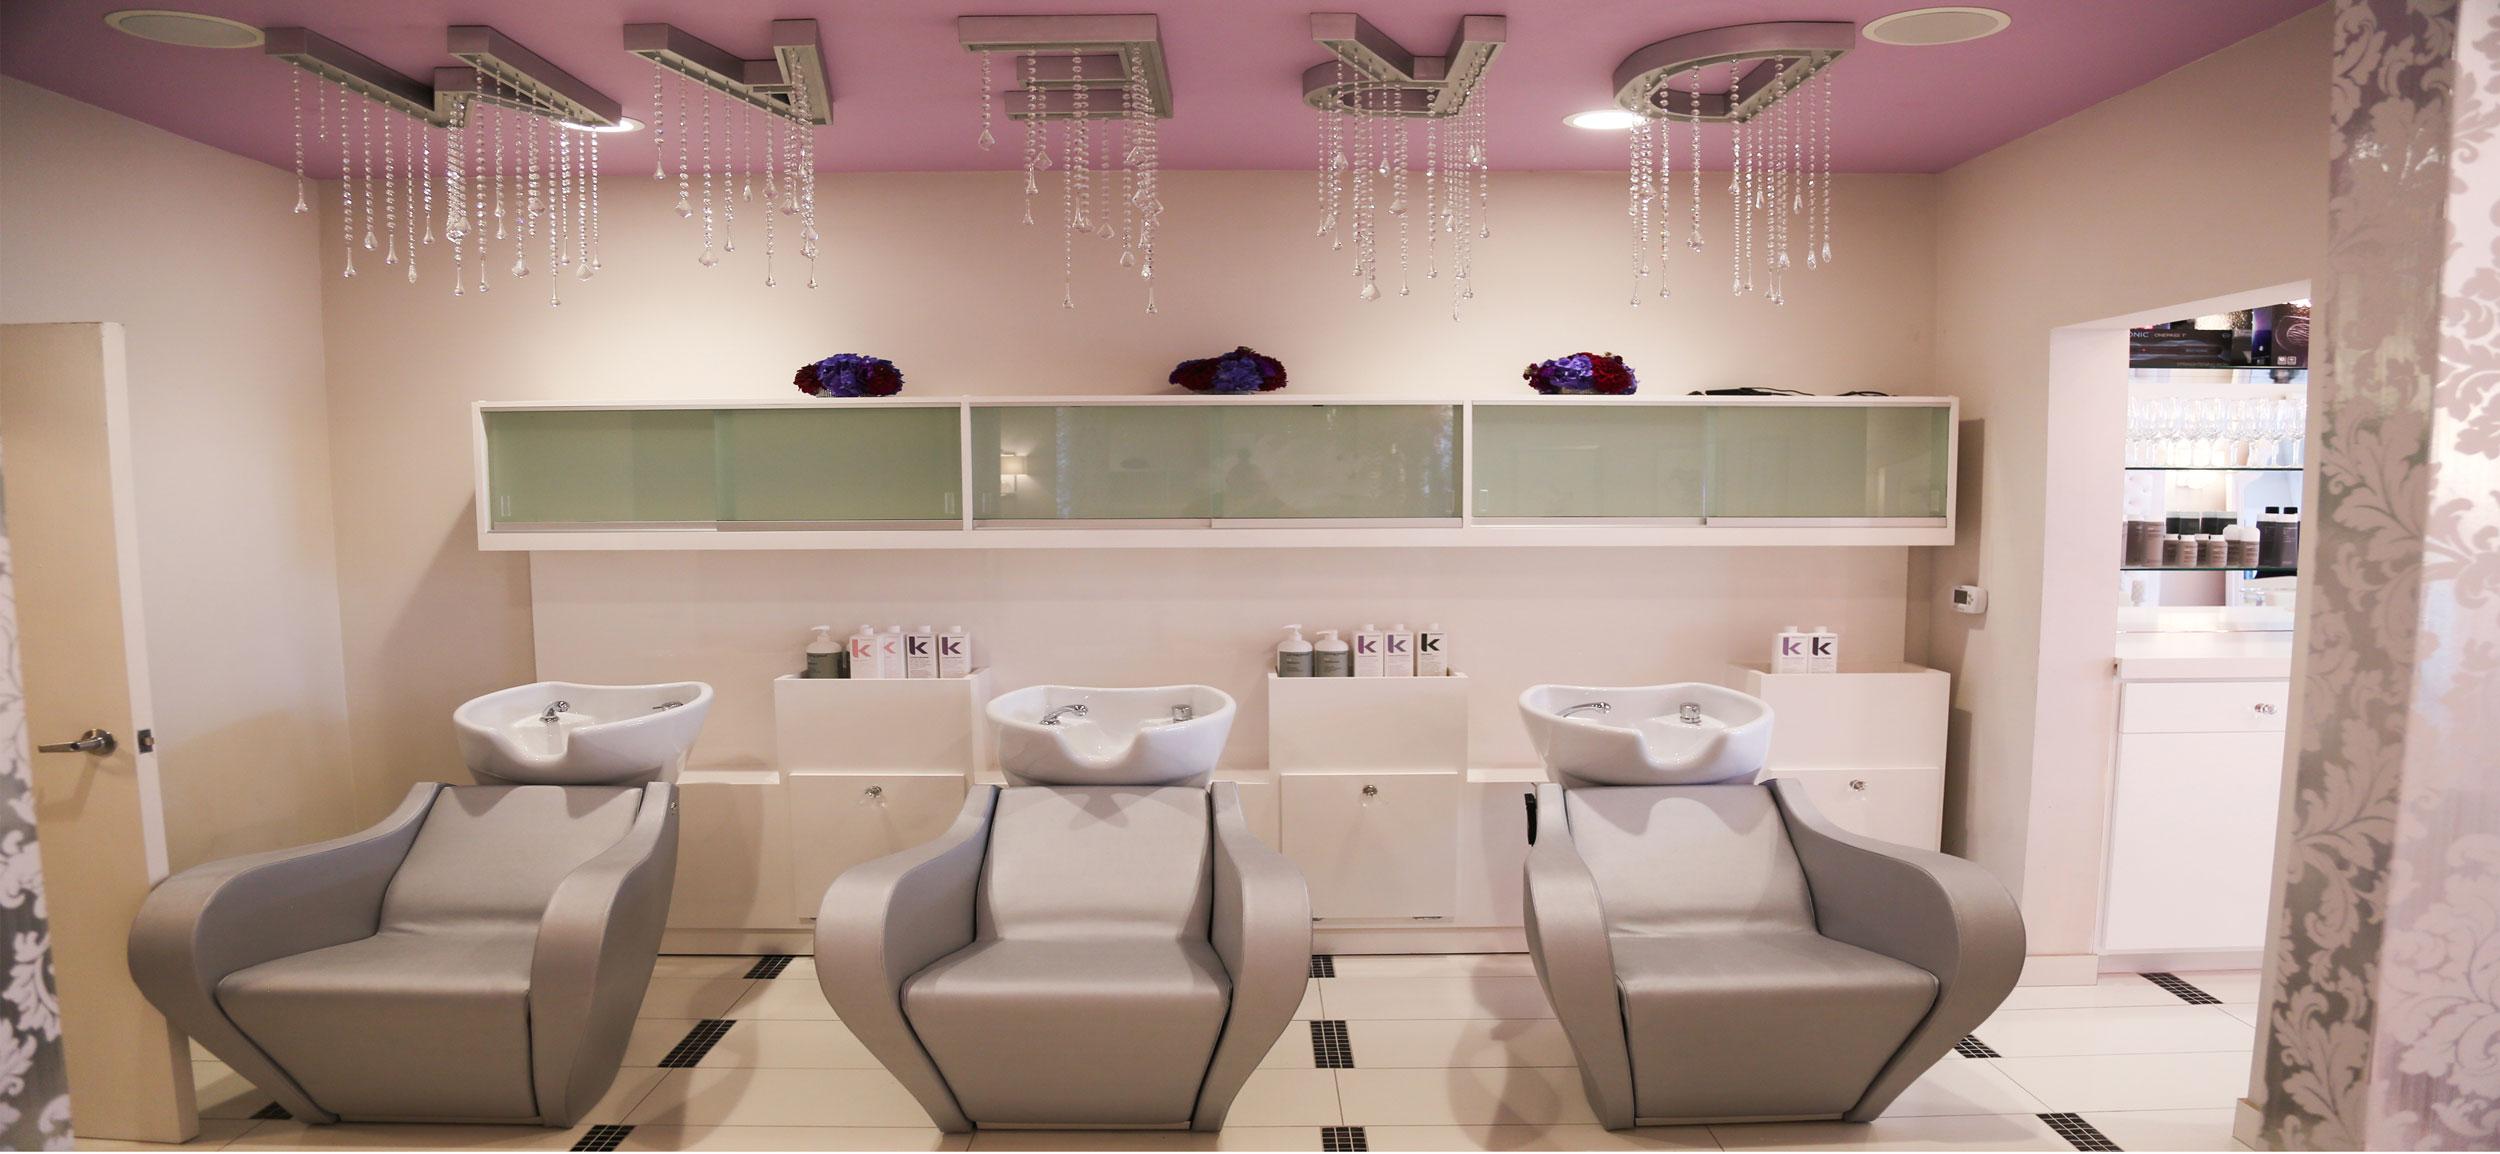 Shampoo Stations